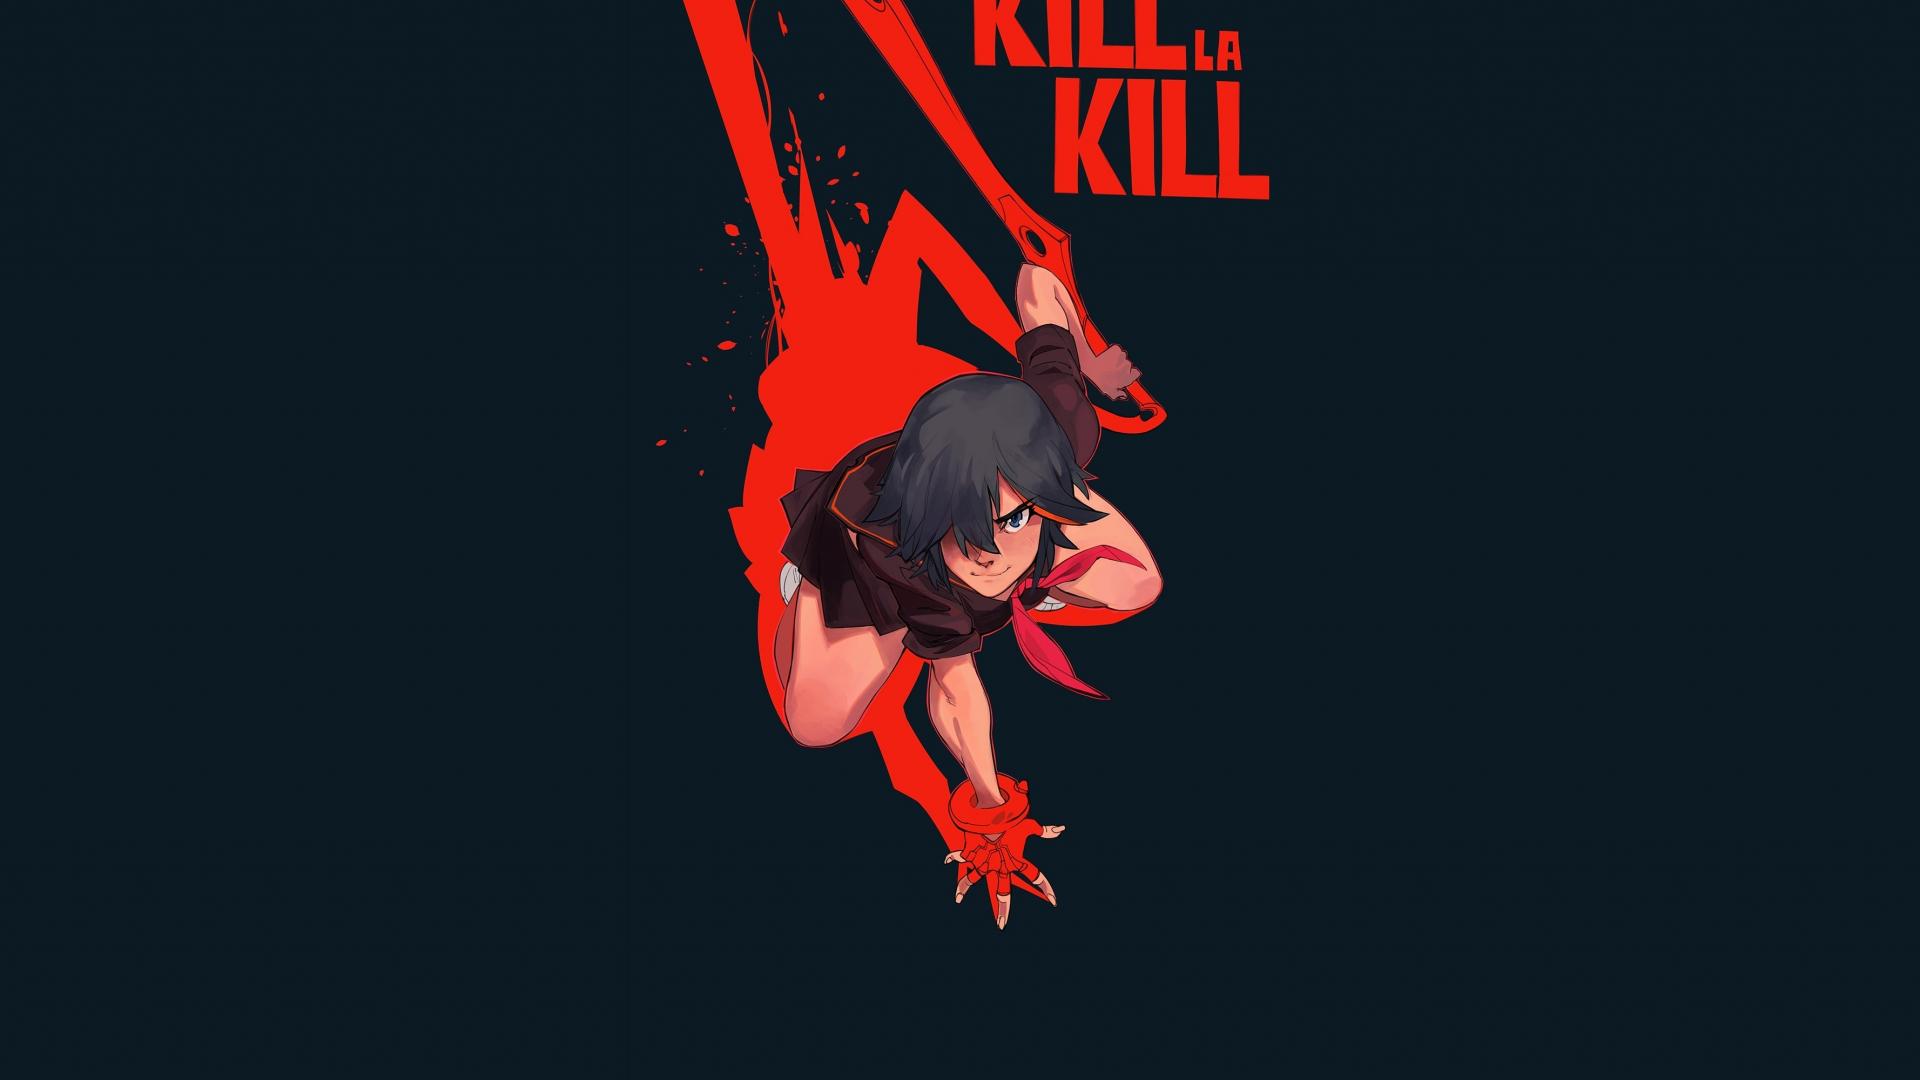 Download 1920x1080 Wallpaper Ryuko Matoi Kill La Kill Anime Girl